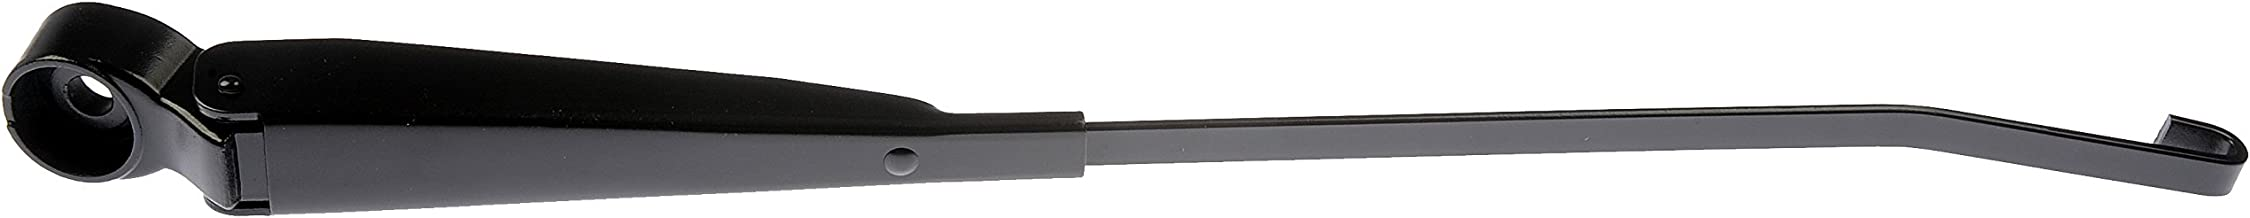 DORMAN 42889 Wiper Arm